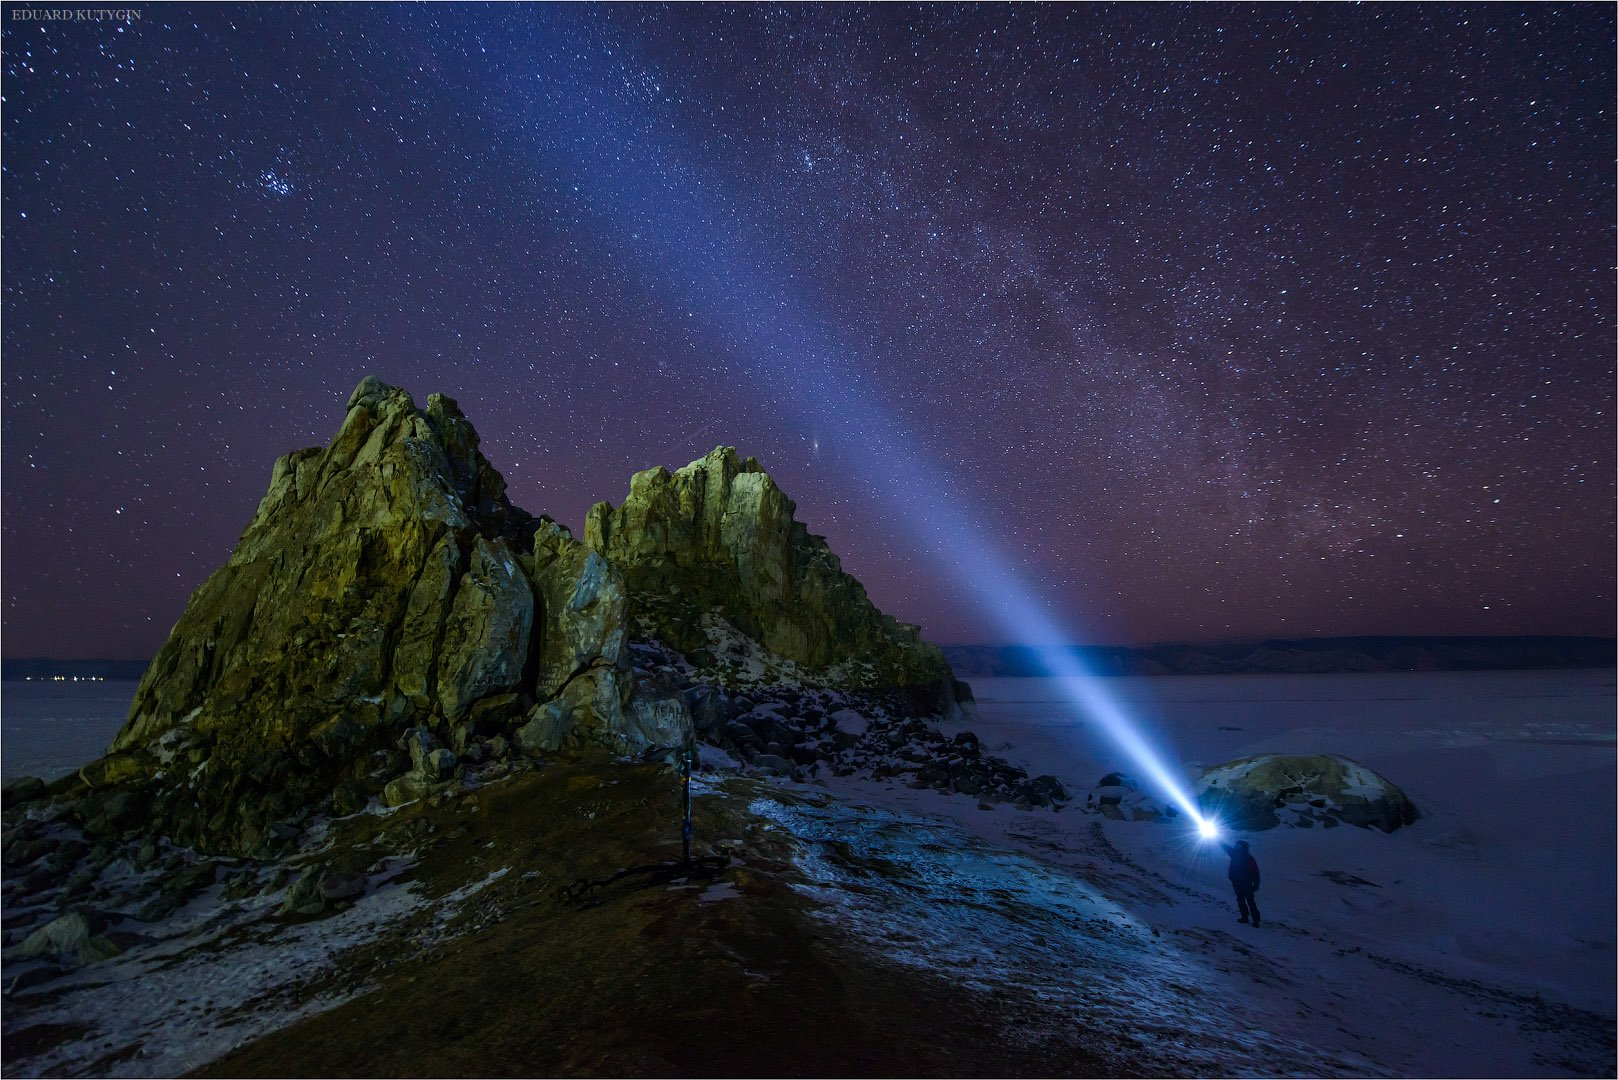 Байкал хужир шаманка фонарь кутыгин, Кутыгин Эдуард